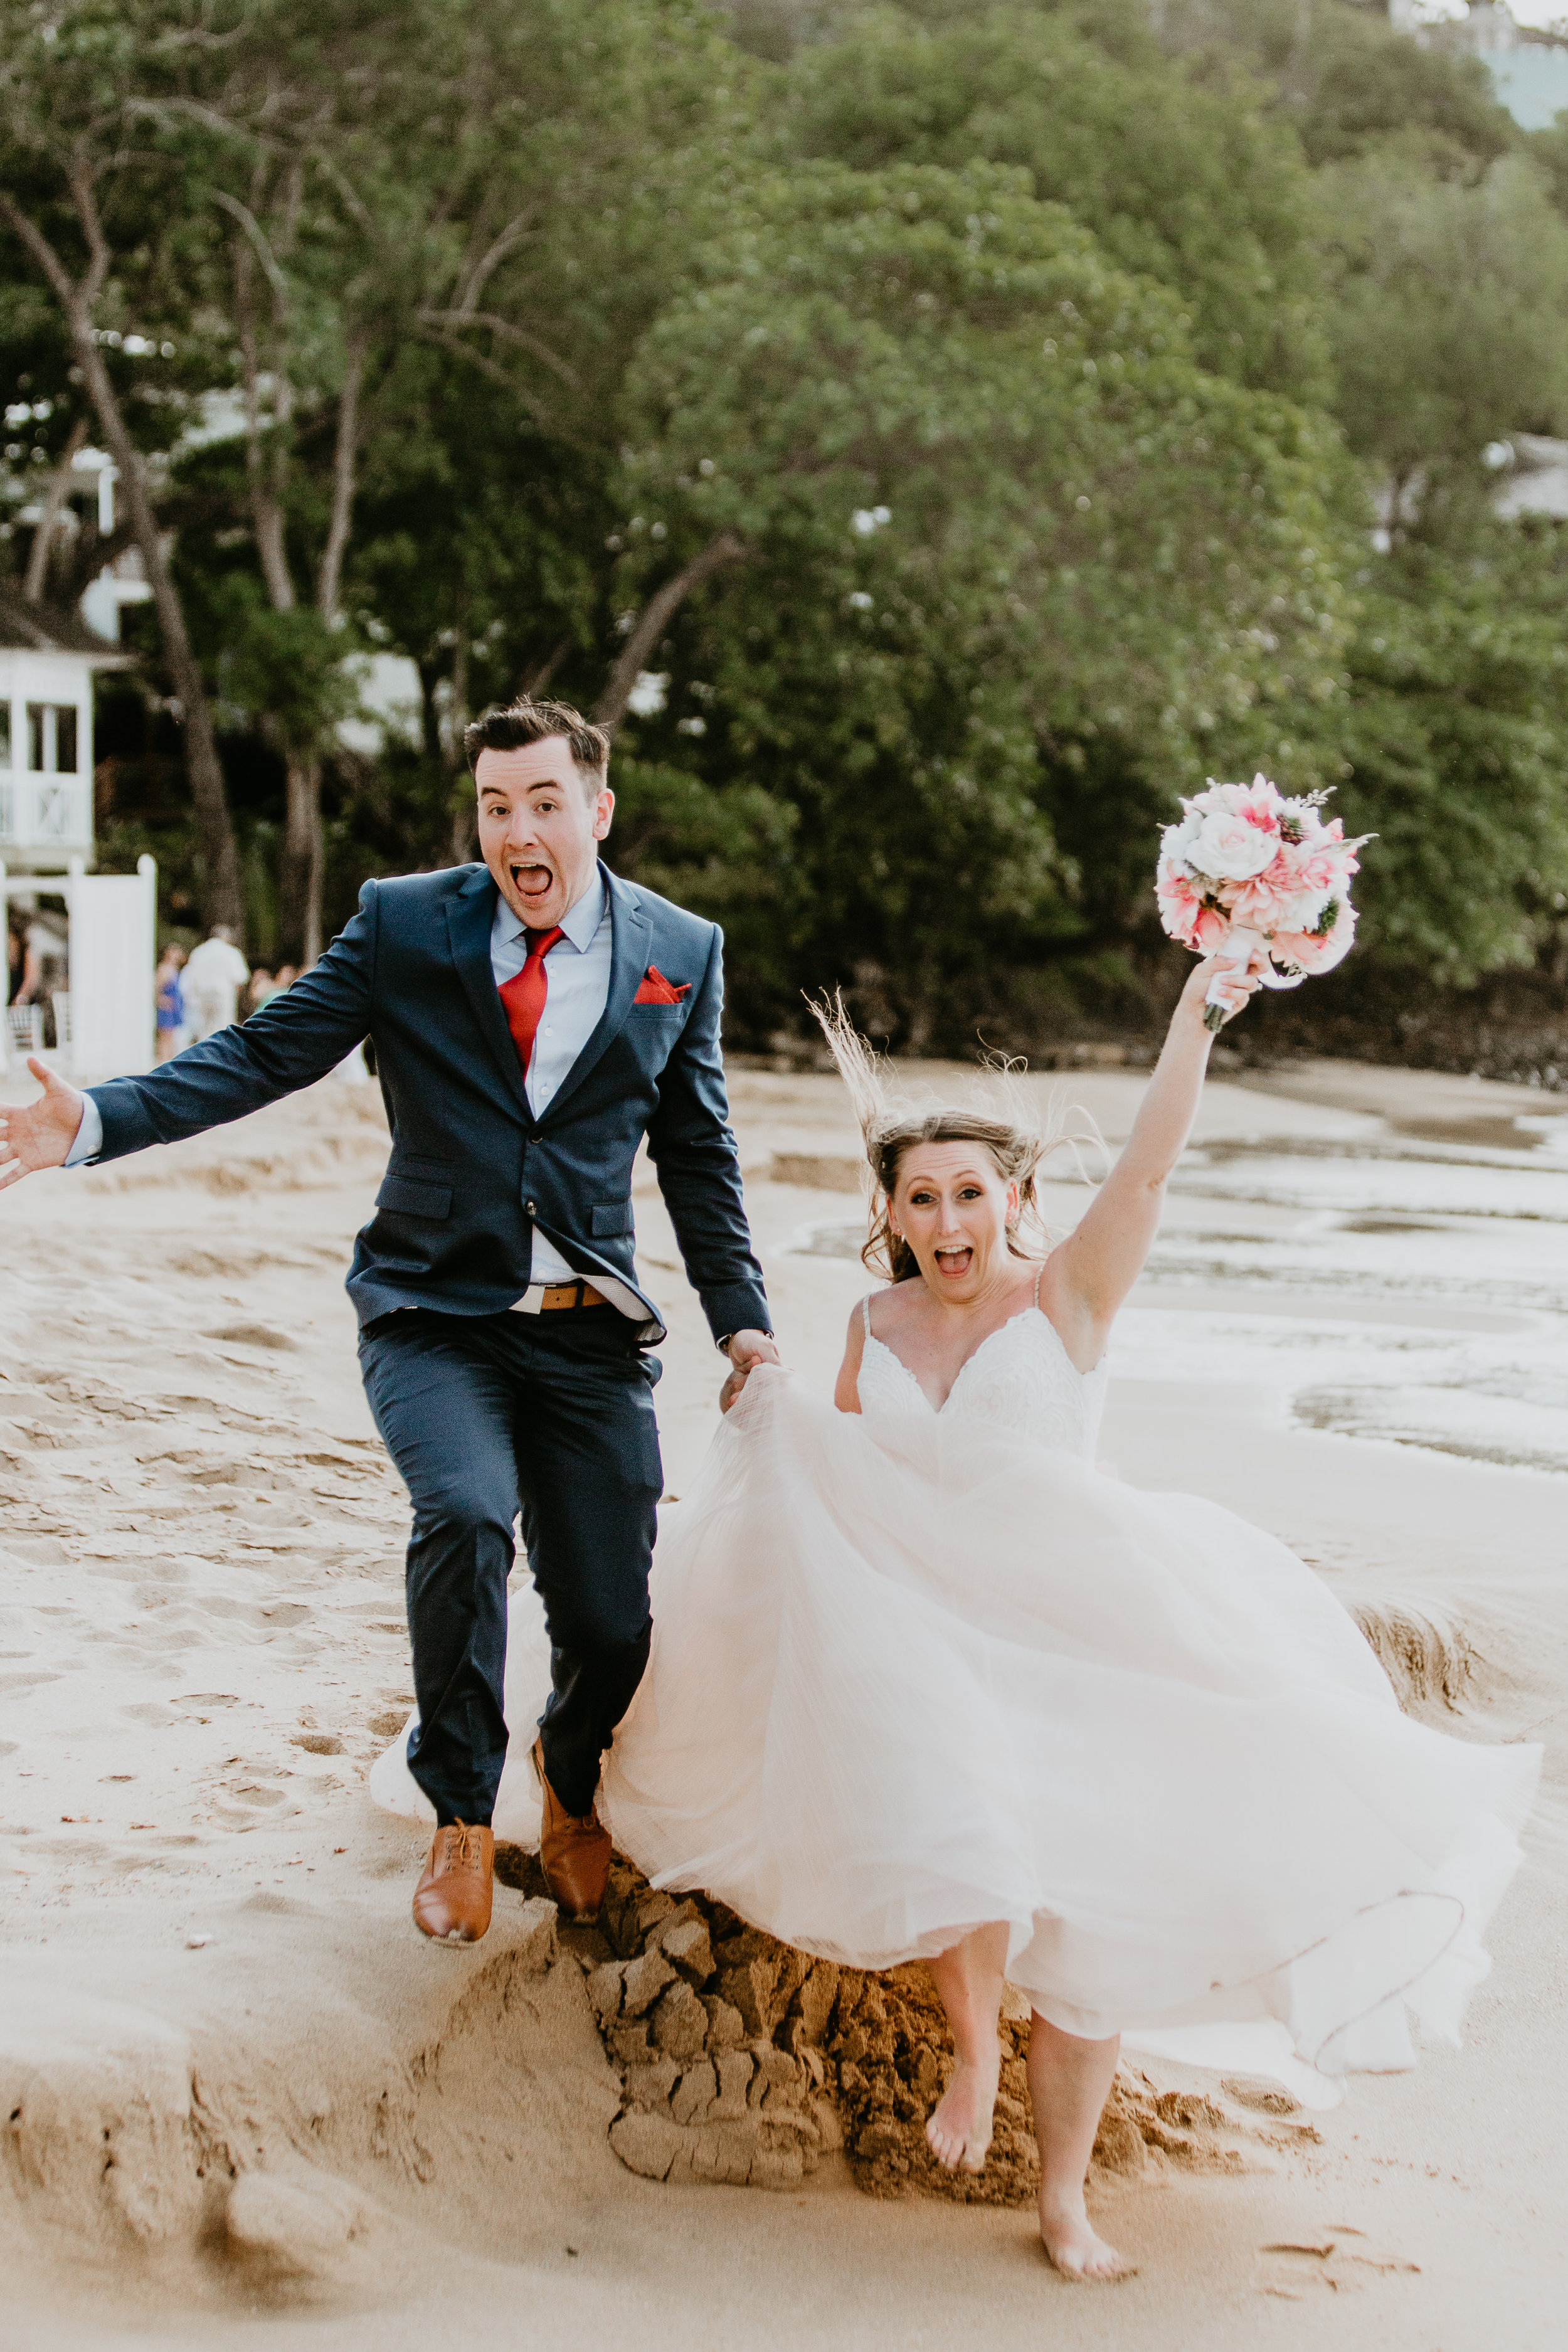 nicole-daacke-photography-destination-wedding-in-st-lucia-sandals-la-toc-intimate-island-wedding-carribean-elopement-photographer-chill-island-wedding-87.jpg